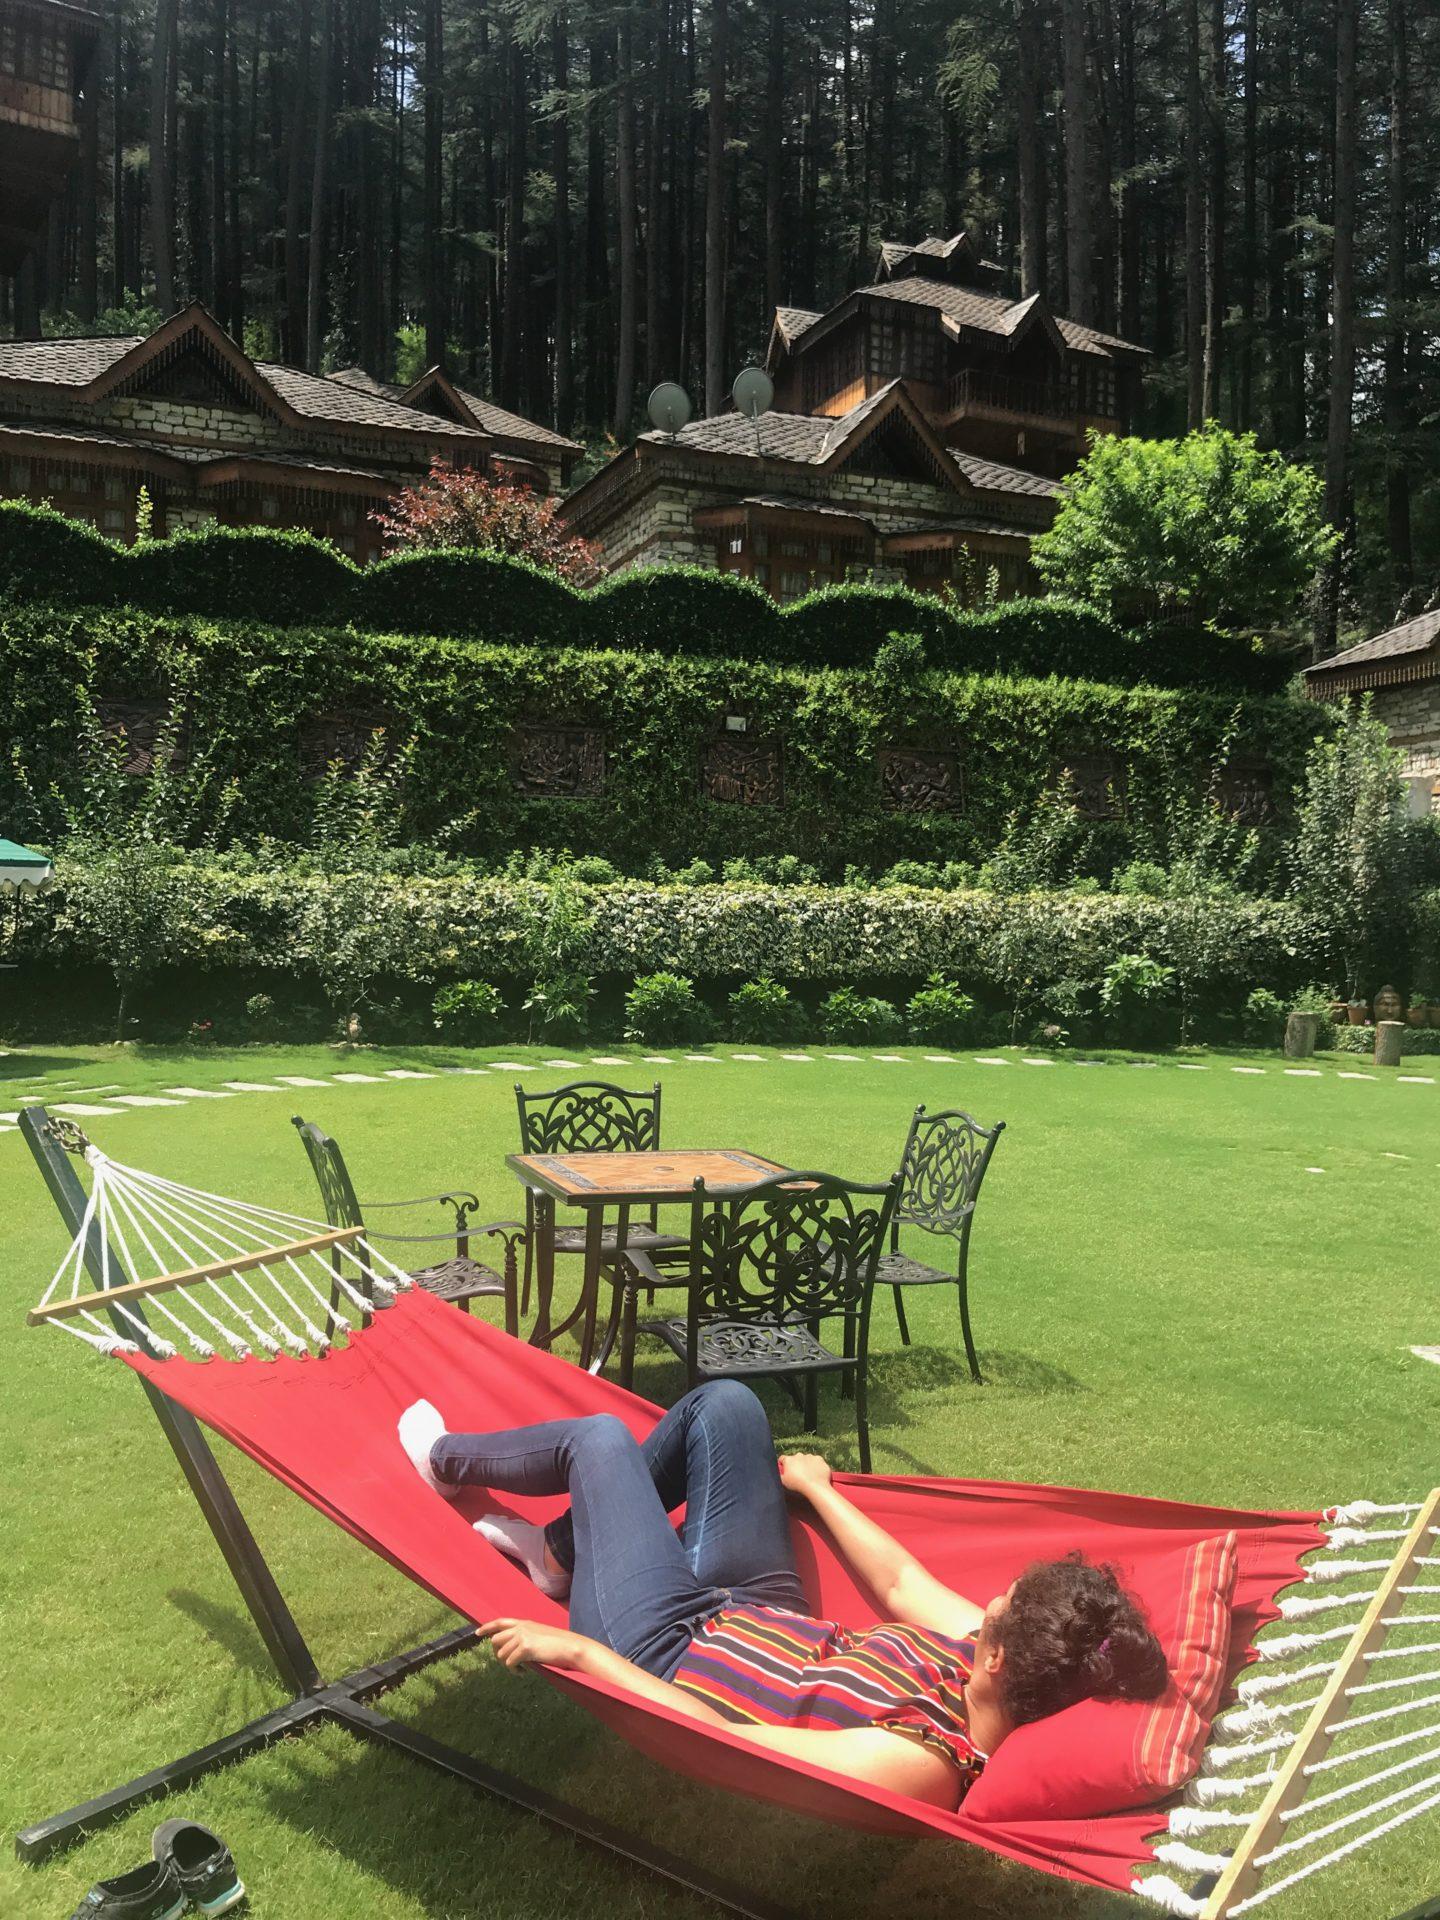 Best Hotels And Homestays In Himachal Pradesh Thatgoangirl Guide